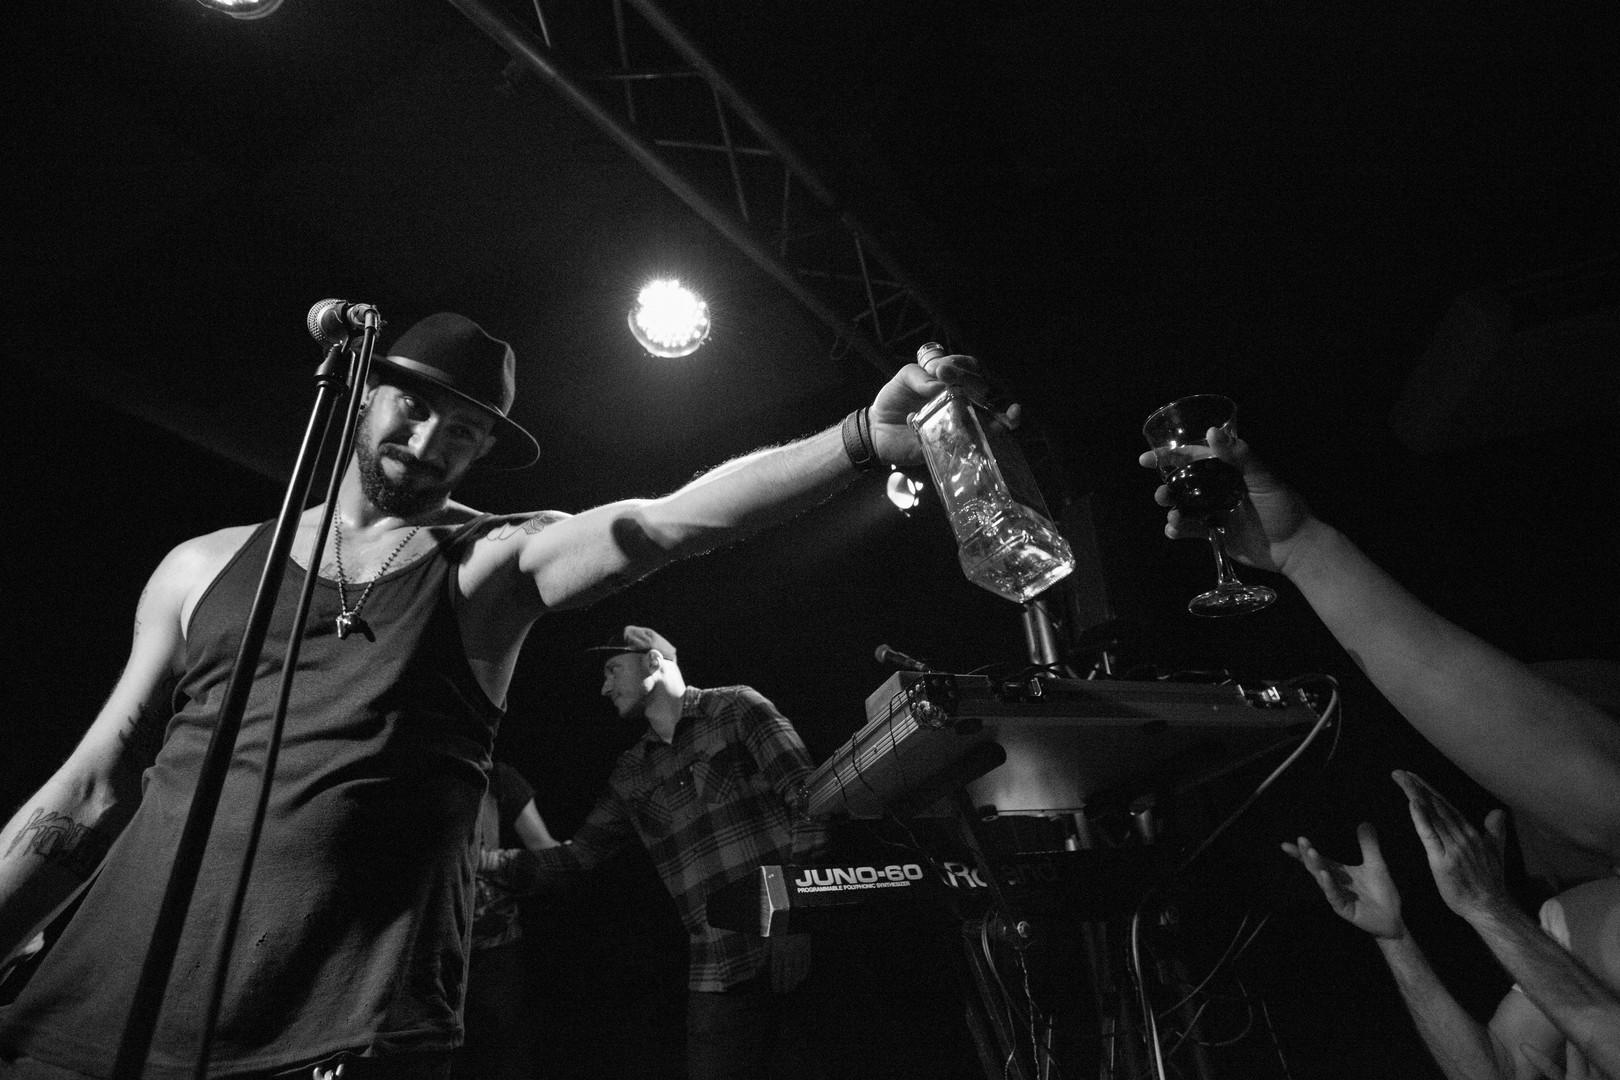 photography photographie concert  performance performer son chanteur tchin